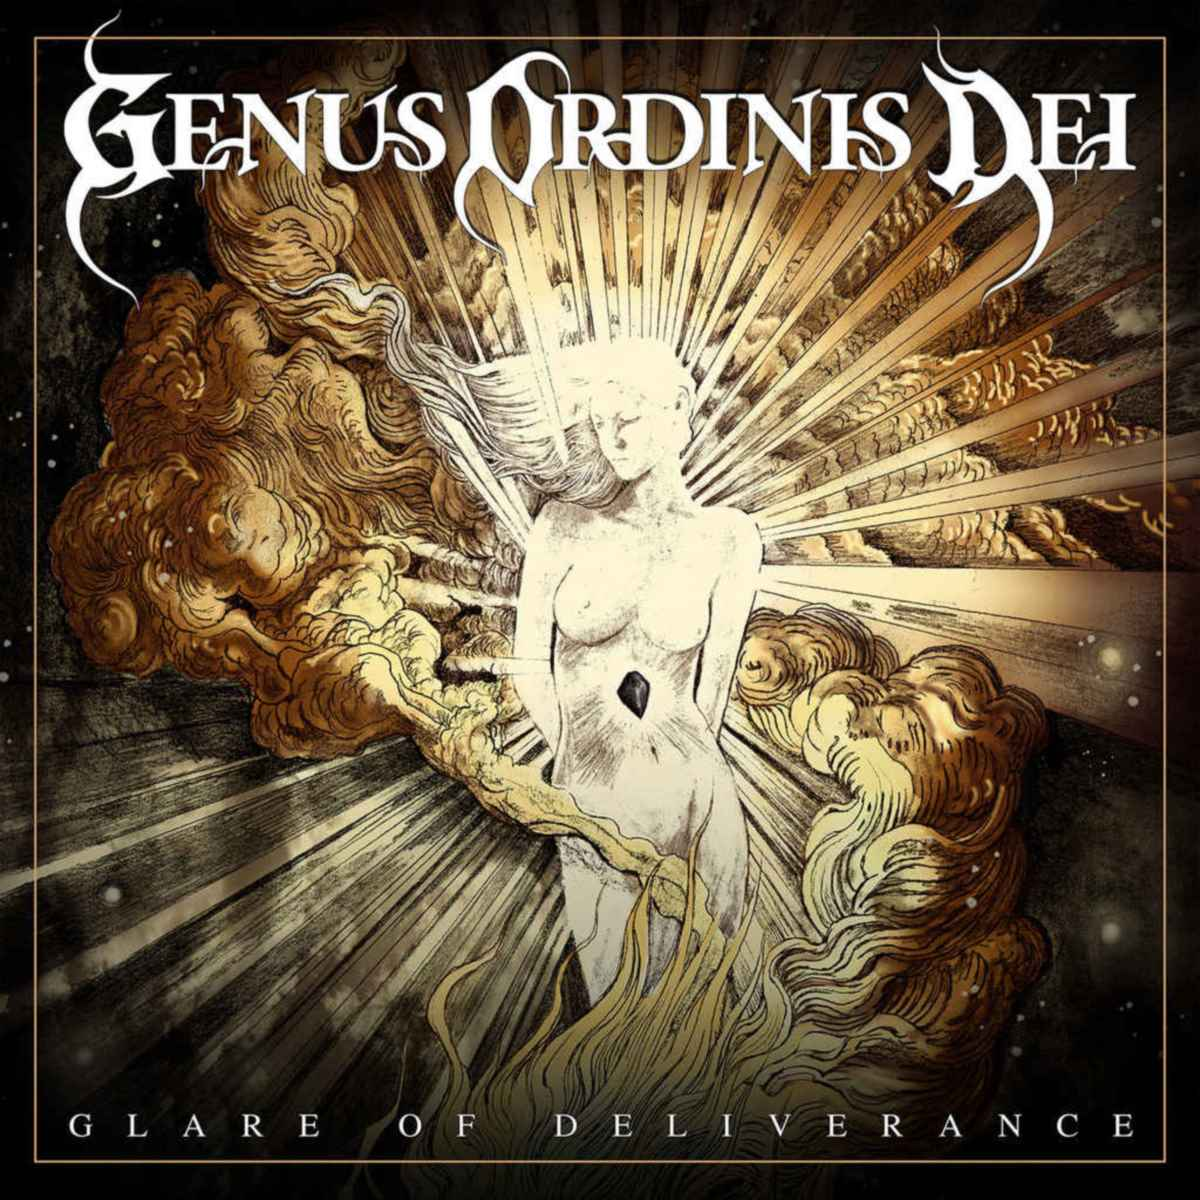 GENUS ORDINIS DEI - Glare of Deliverance - album cover